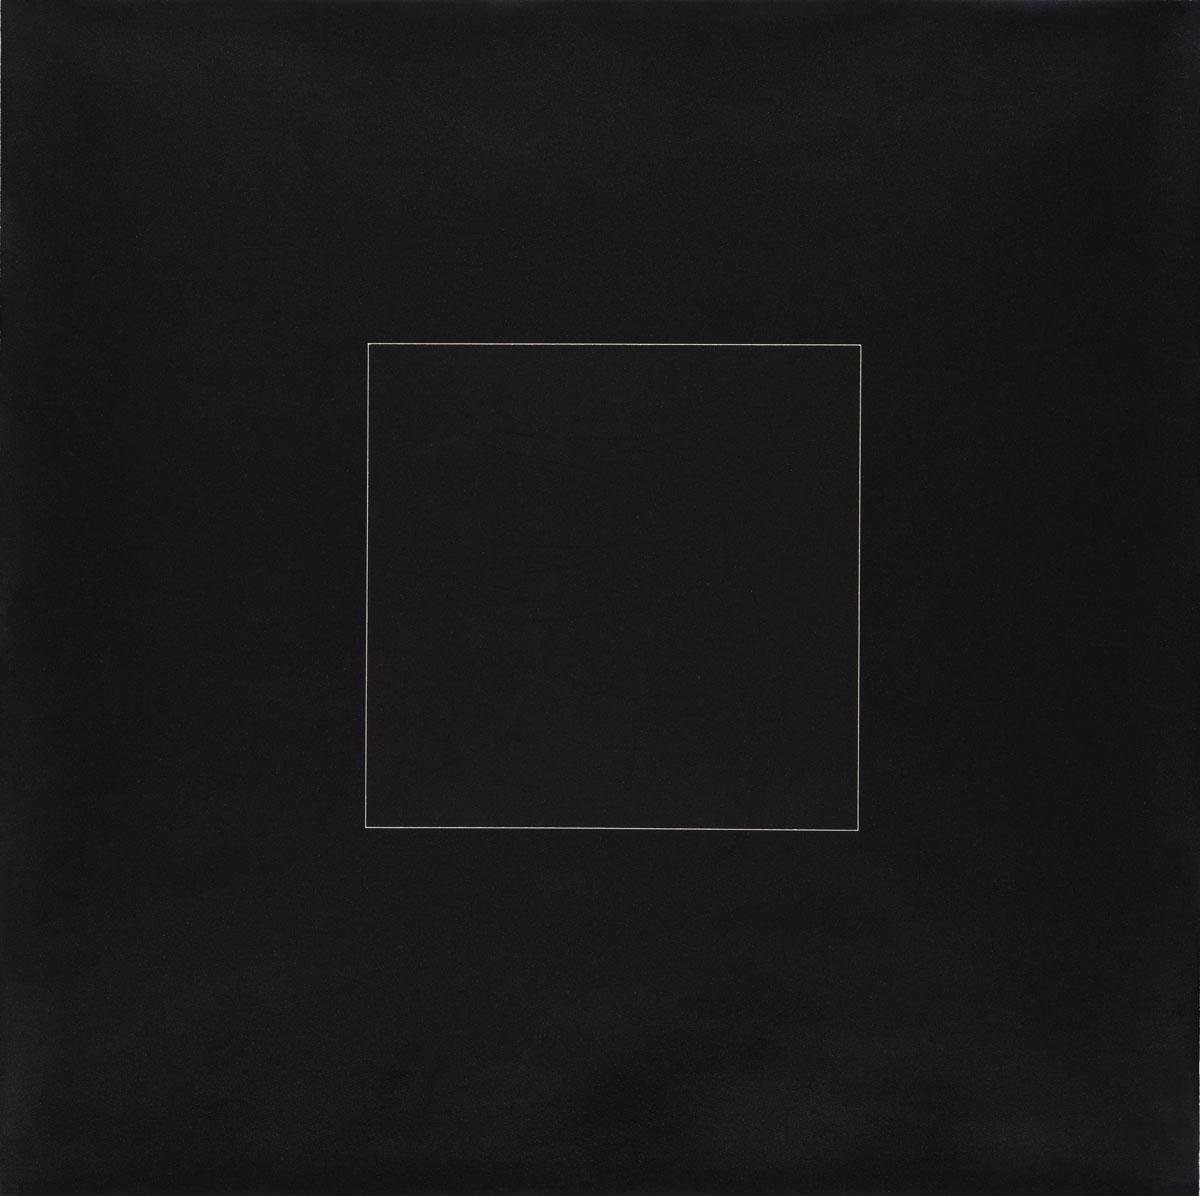 "PIERRE CORDIER. Chimigramme 26/8/77 VI ""Minimal Photography"", 1977. Chemigramm. Unikat. 50 x 50 cm"